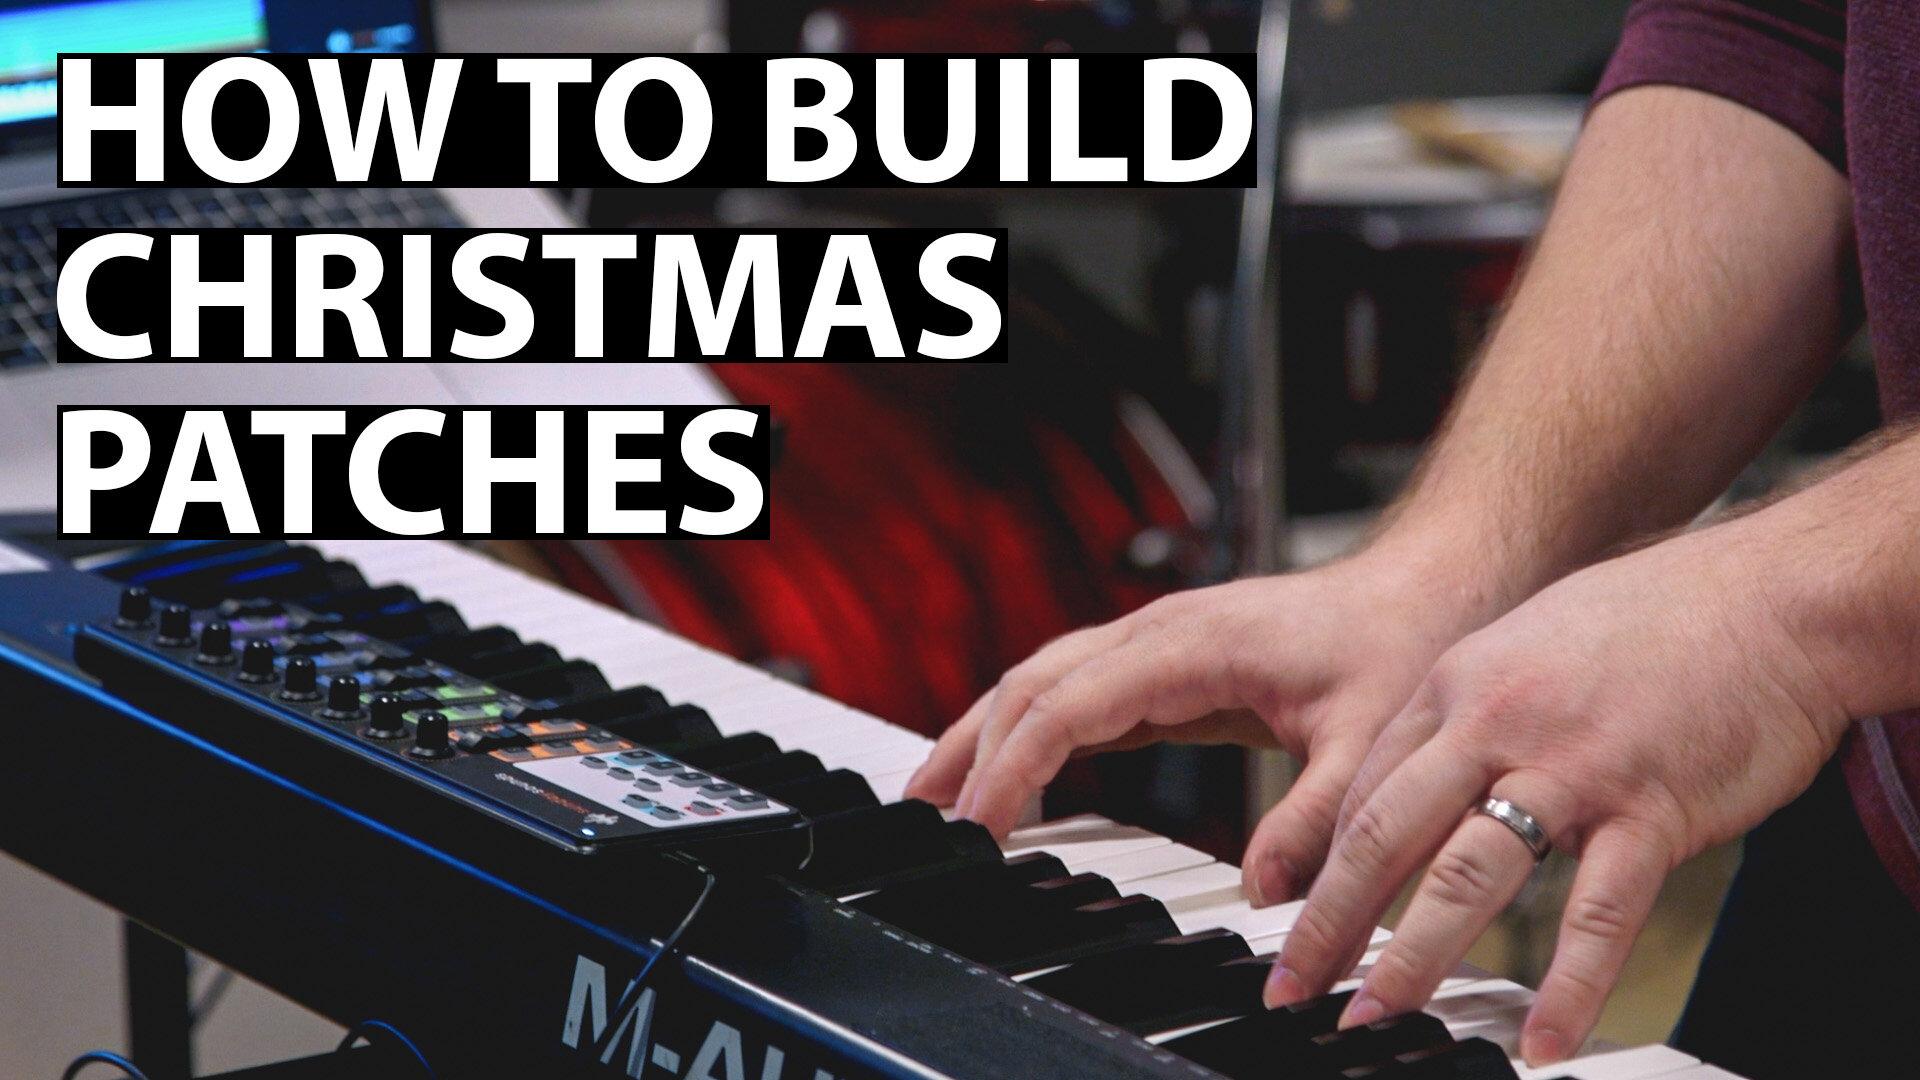 christmas-keys-sounds-traditional-mainstage-3-omnisphere-ableton-live-tutorial-walkthrough-free-patches-bells-flute-harp_manger-worship-keyboard-hillsong-album-Jesus-Culture-Phil-Wickham-sunday-sound.jpg